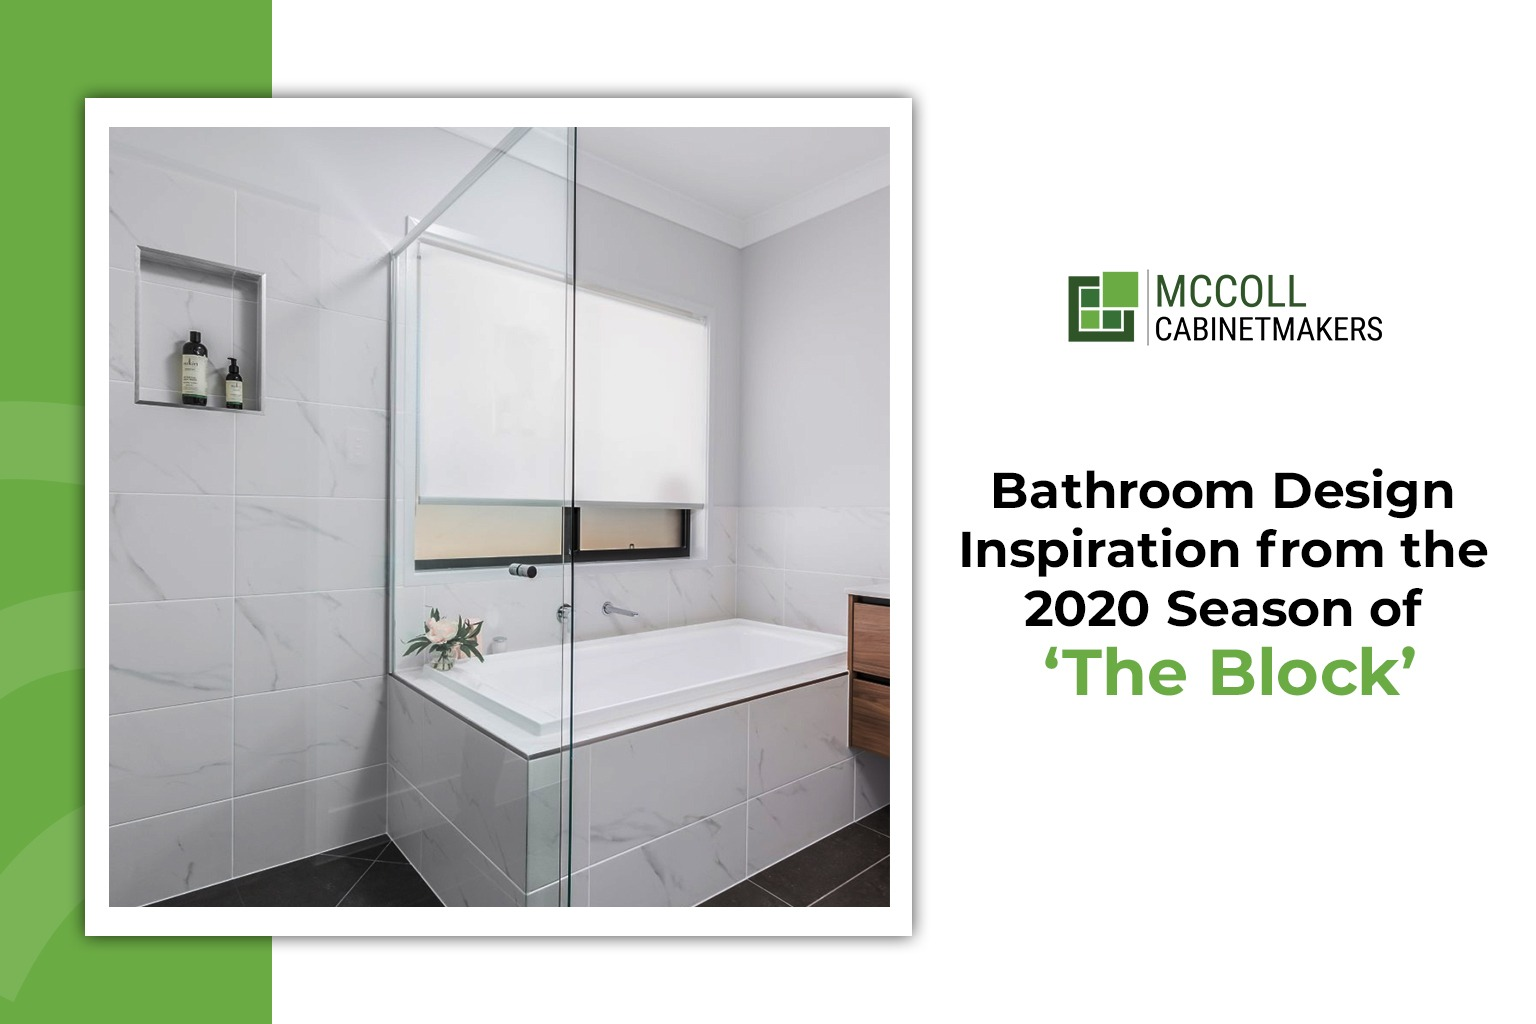 Bathroom Design Inspiration from the 2020 Season of 'The Block'